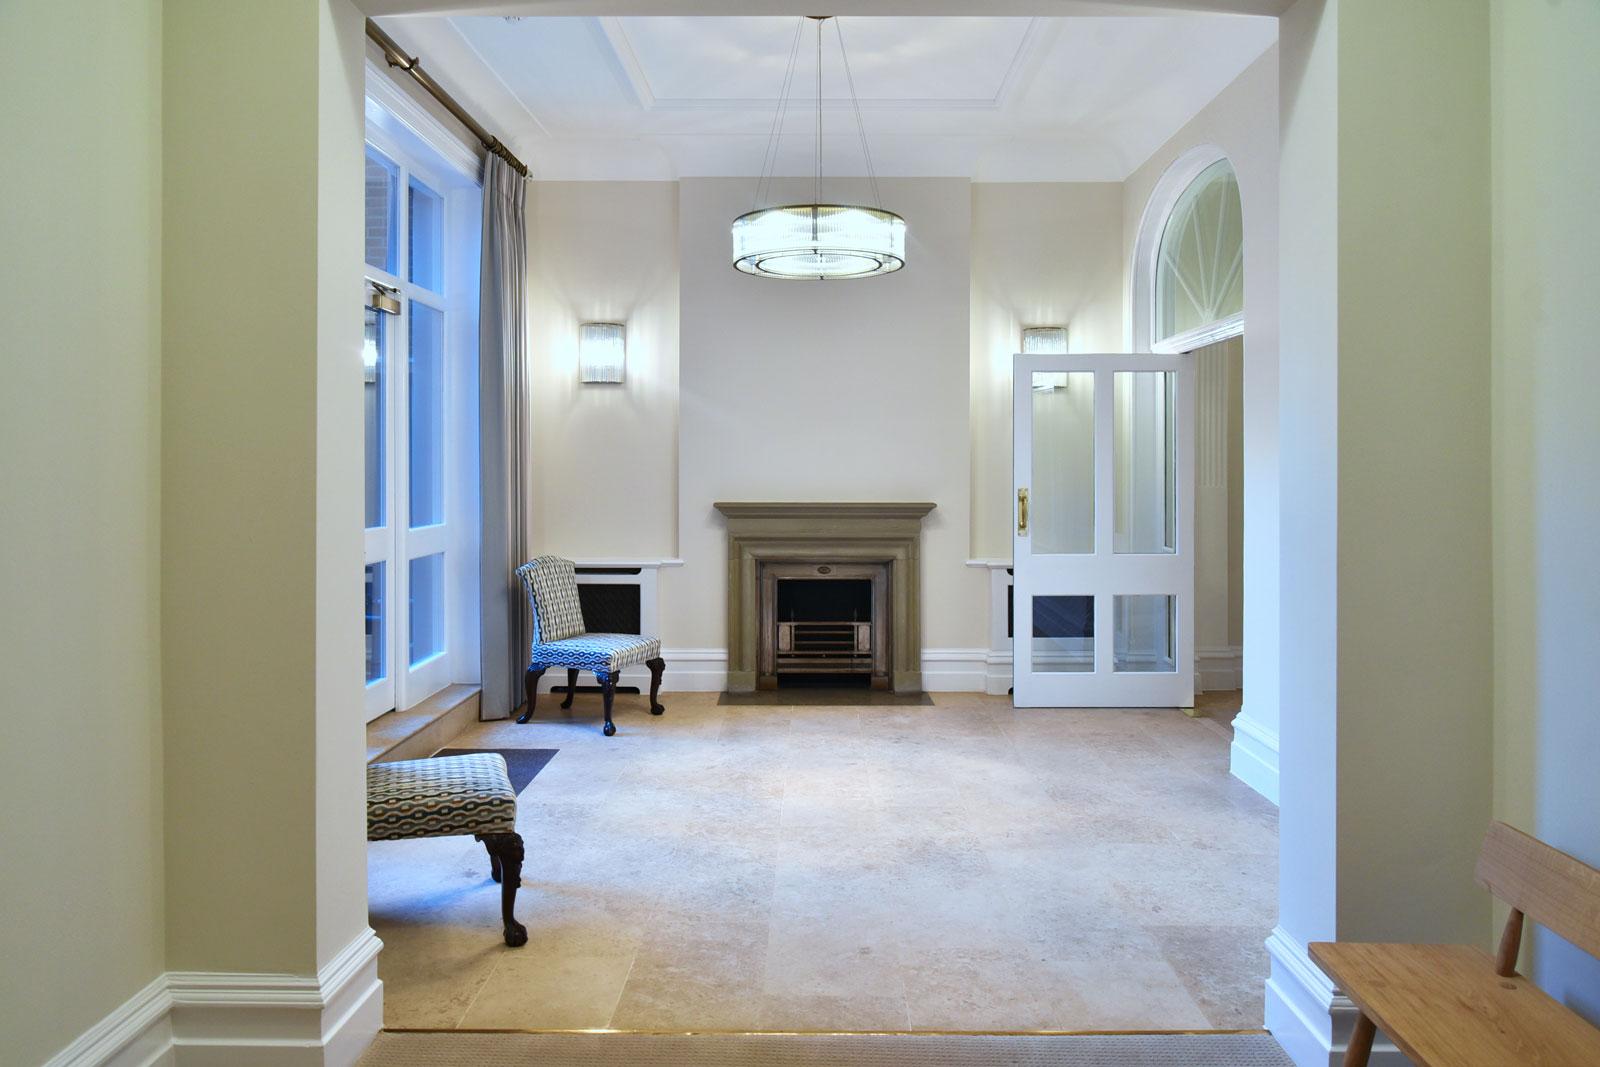 MFG Interior Internal Residential Building Surveyors London